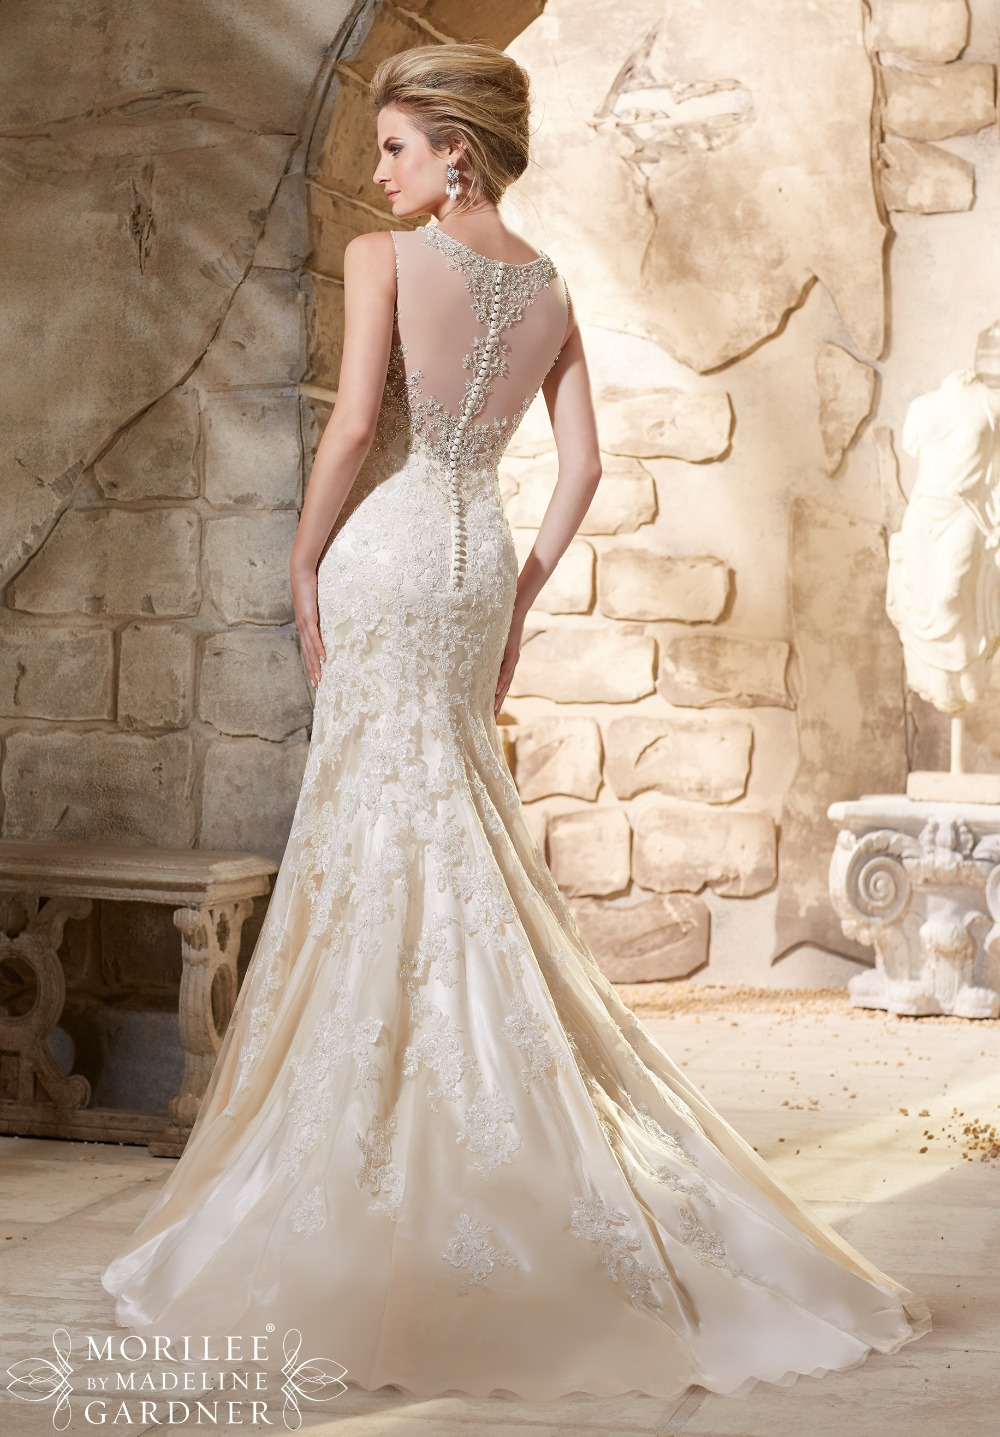 Heavy Beaded Custom Made Elegant Lace Wedding Dress See Through Mermaid  Bride Dresses Robe De Marriage Gown 2015-in Wedding Dresses from Weddings    Events ... f2f105571814